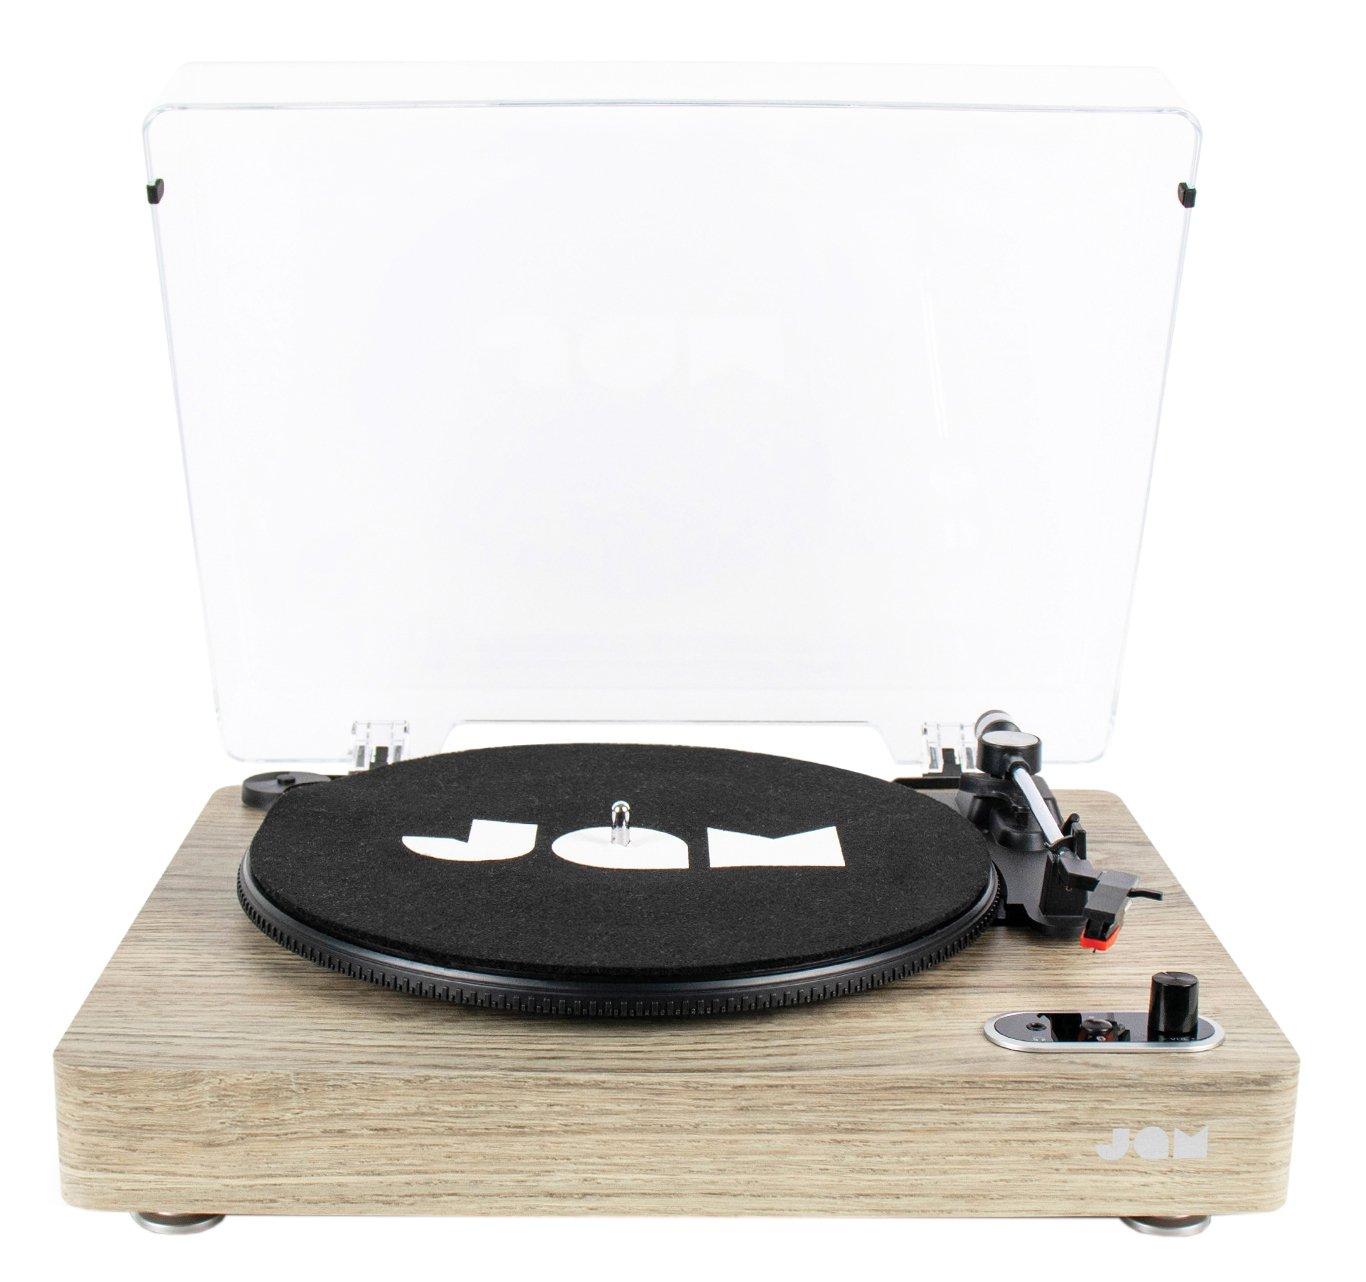 JAM Vinyl Bluetooth Record Player - Light Wood